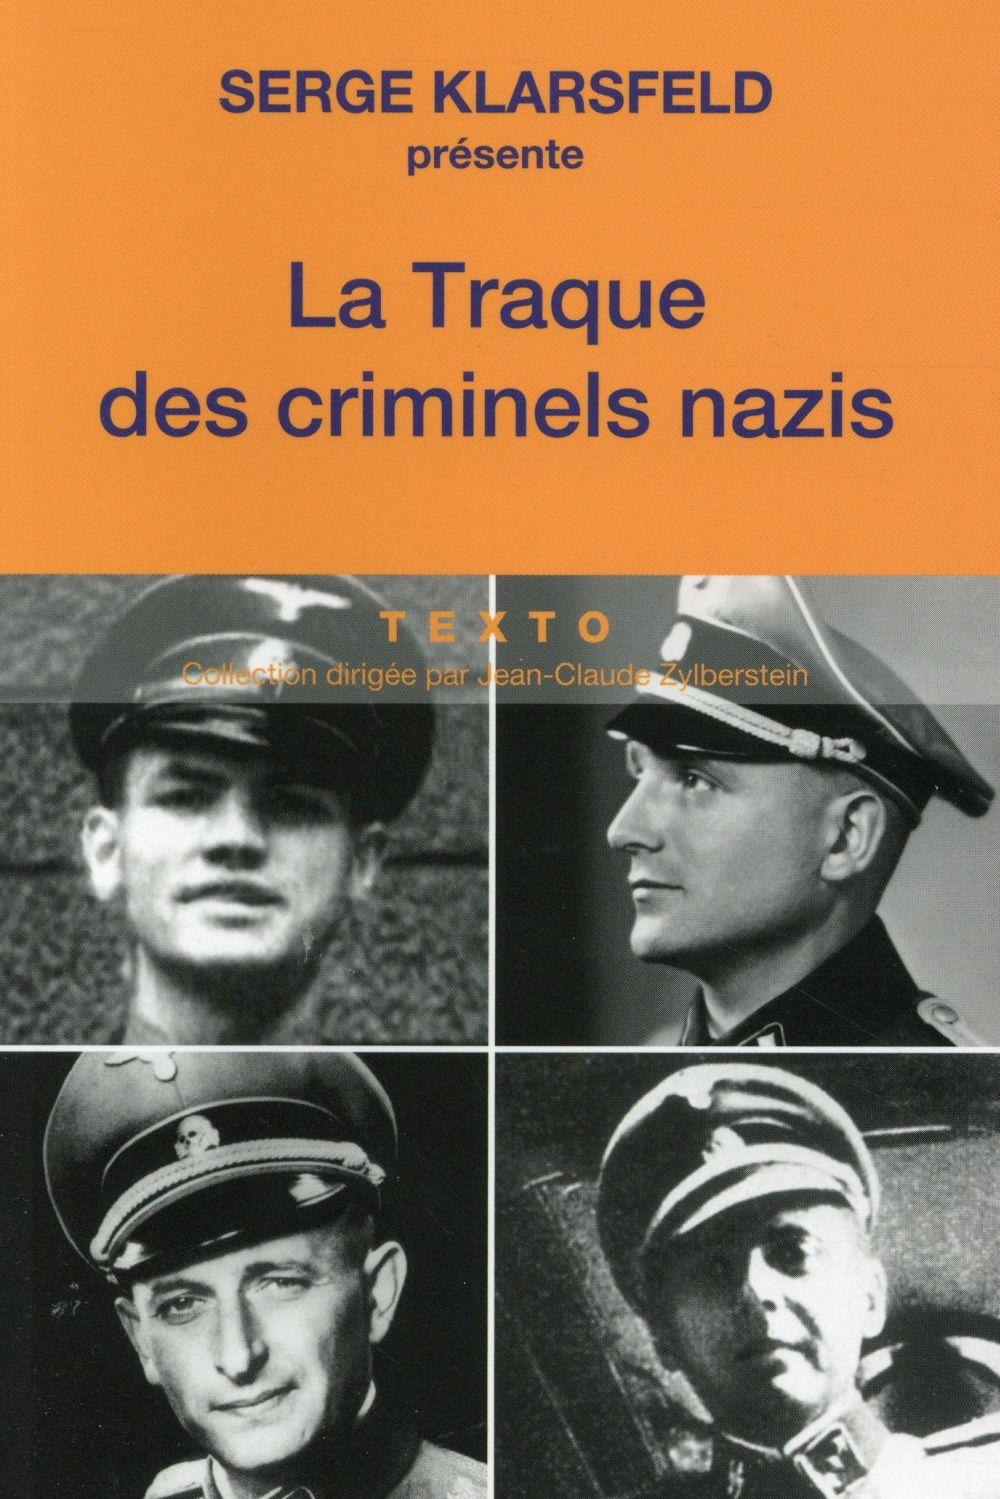 LA TRAQUE DES CRIMINELS NAZIS  Tallandier